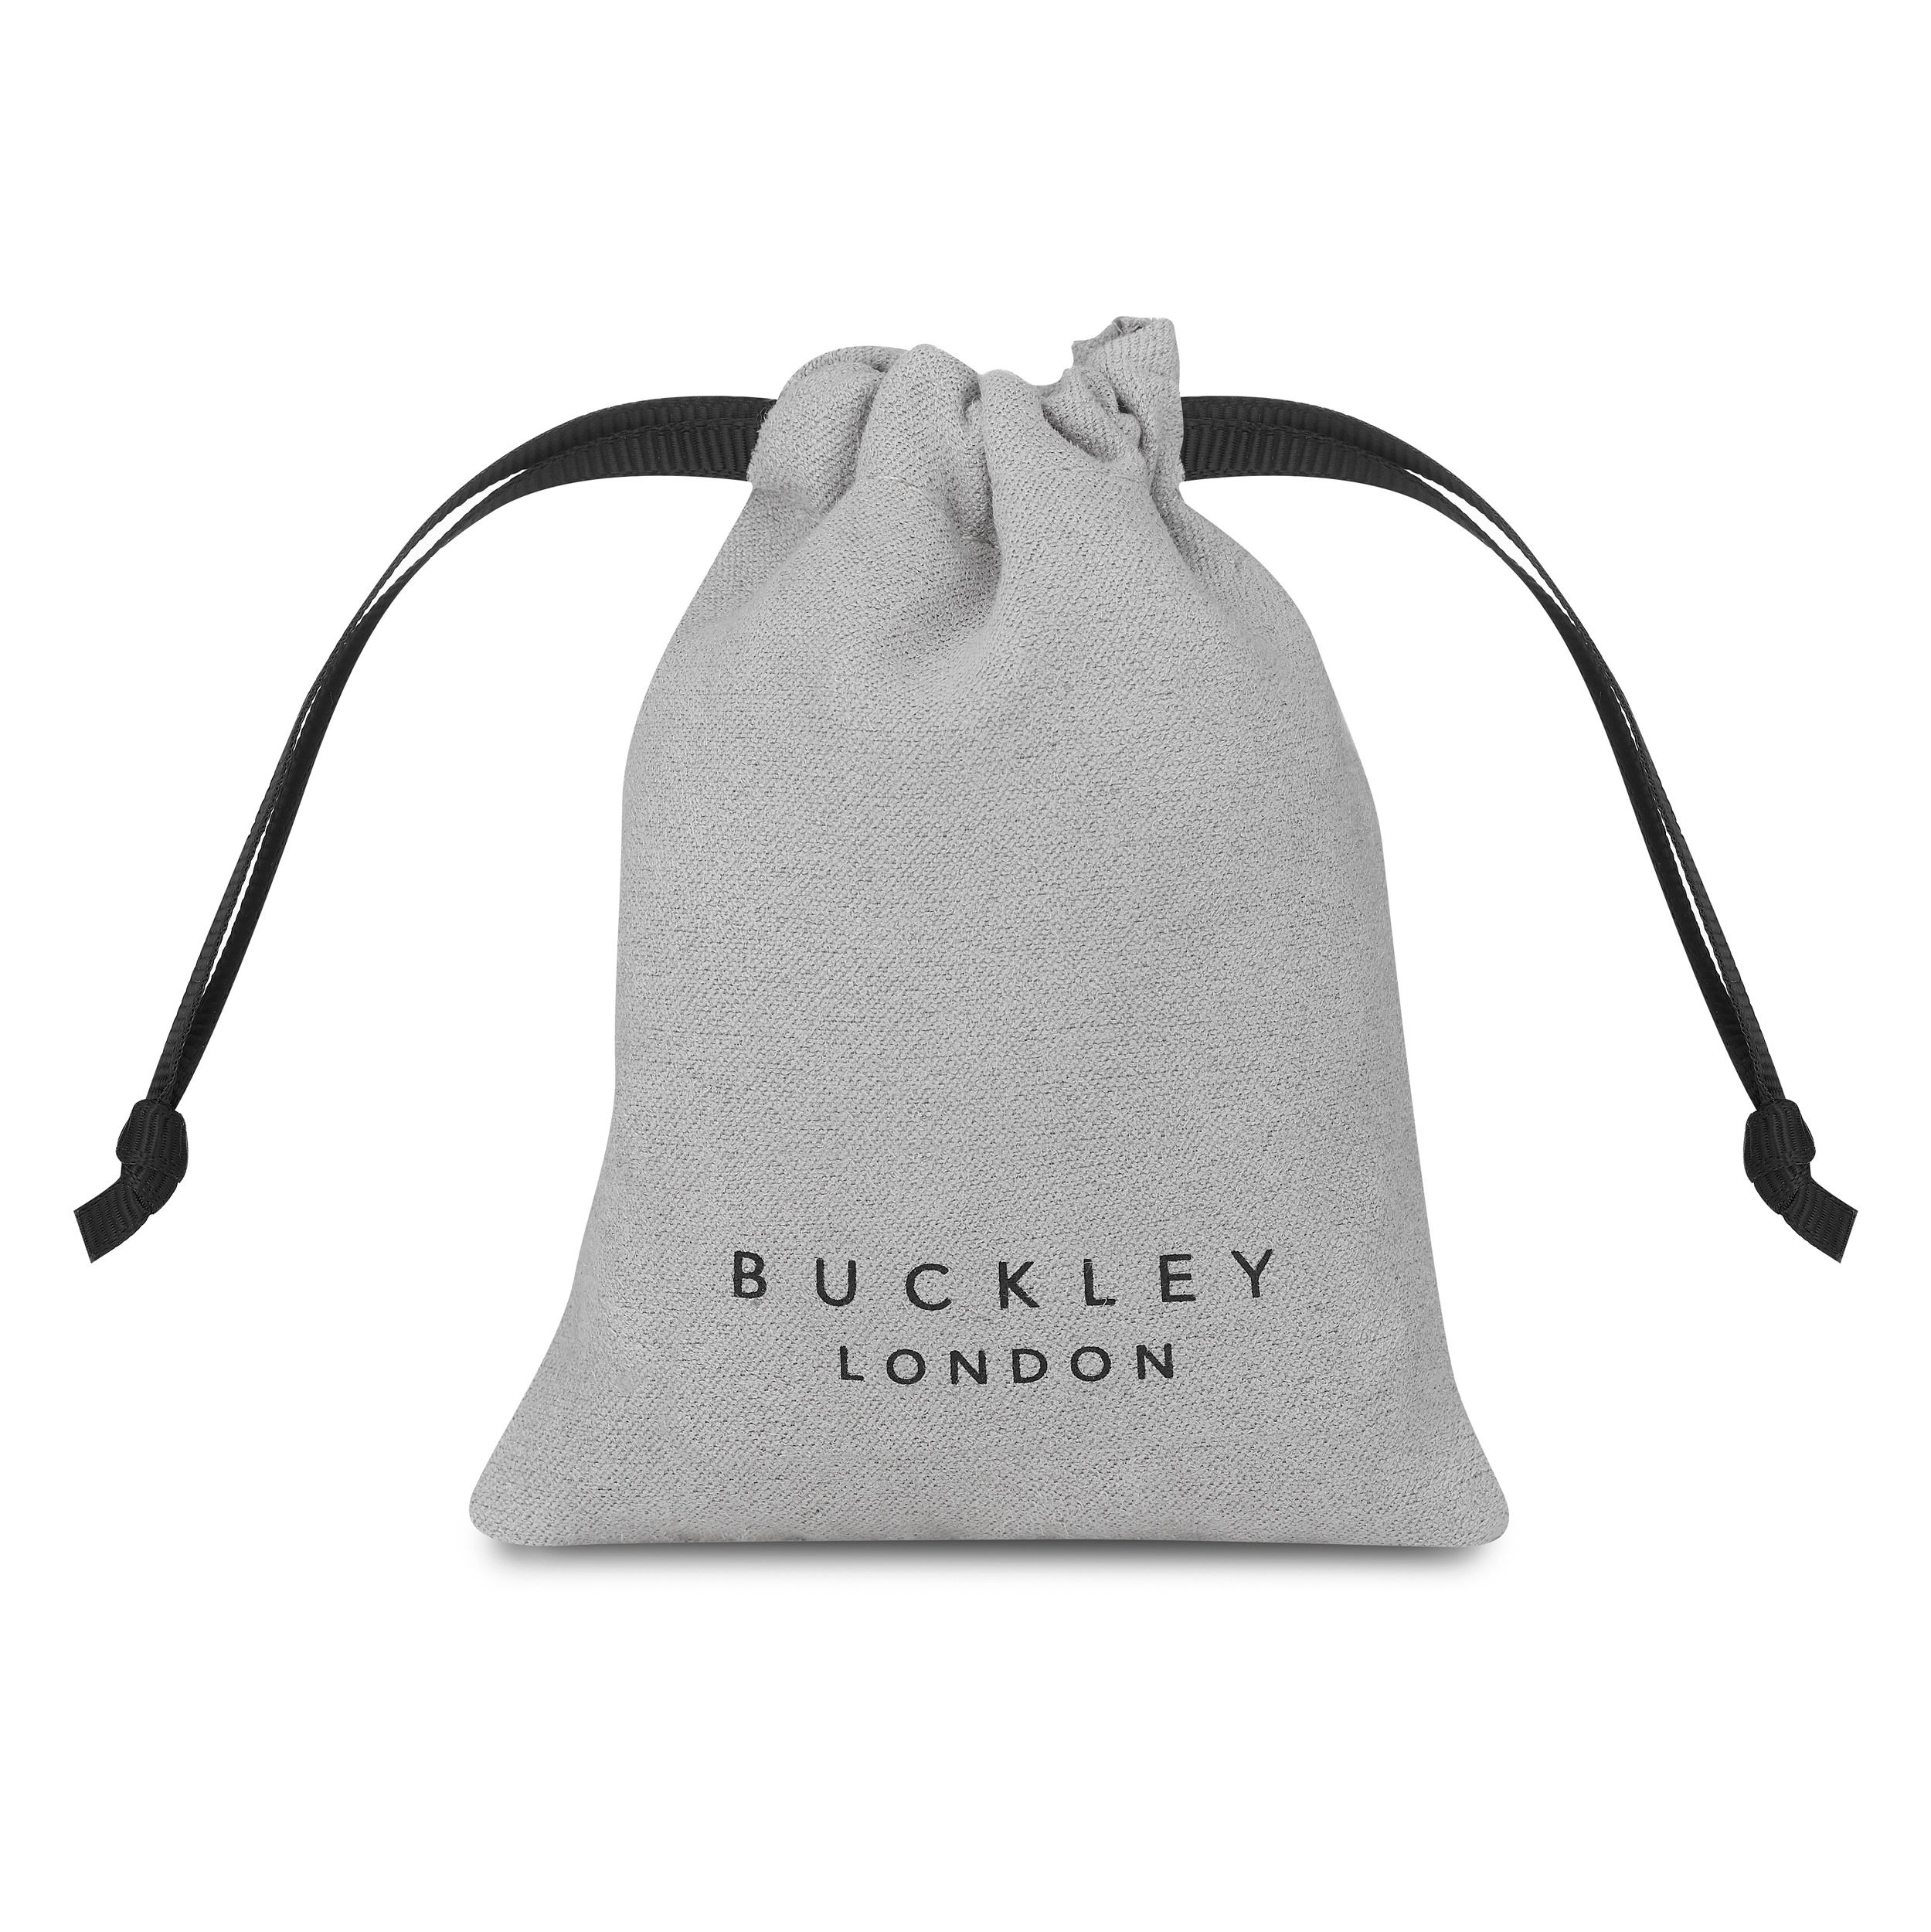 Buckley London Hugs & Kisses 'X' Bracelet - Silver Bag